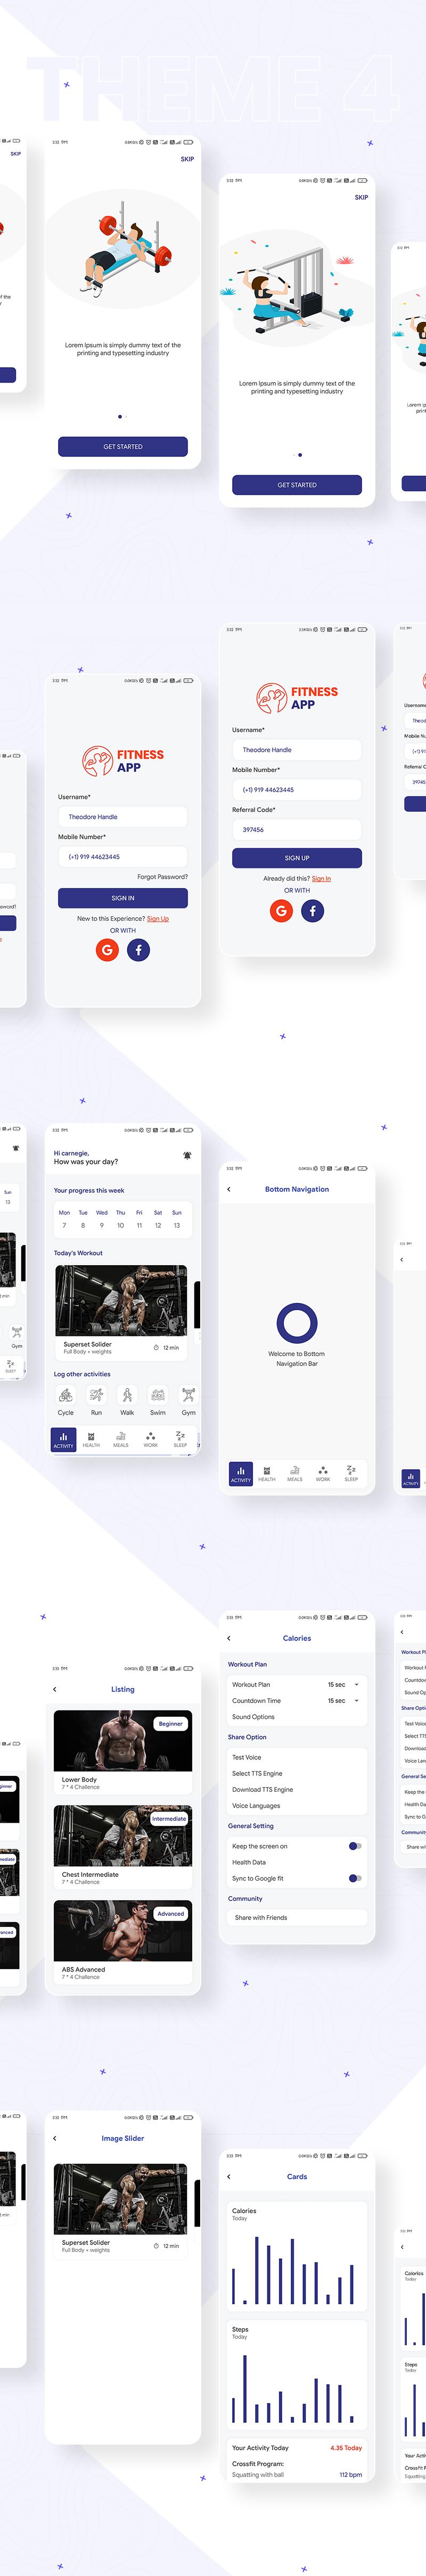 Prokit - Biggest Android UI Kit - 21 biggest android ui kit Prokit theme 4